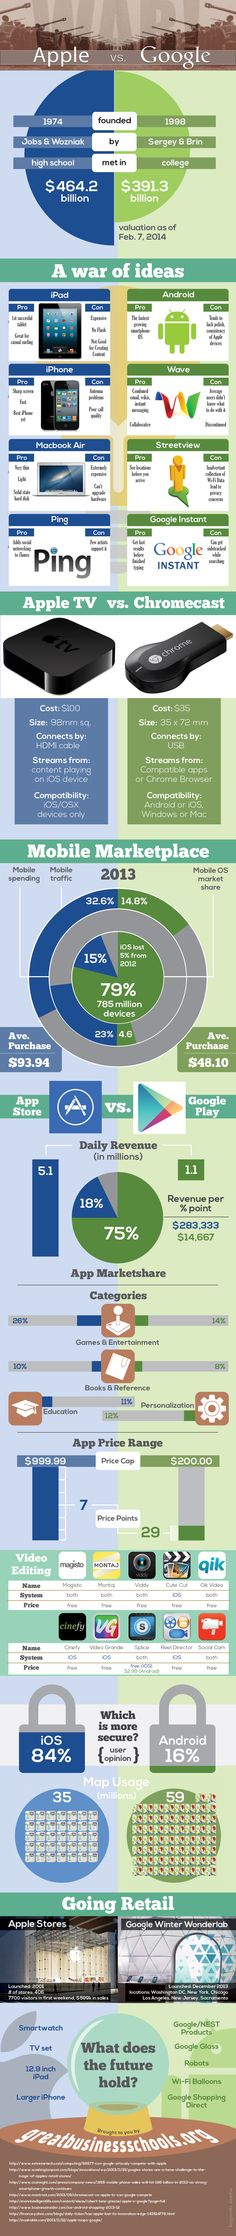 Google vs. Apple